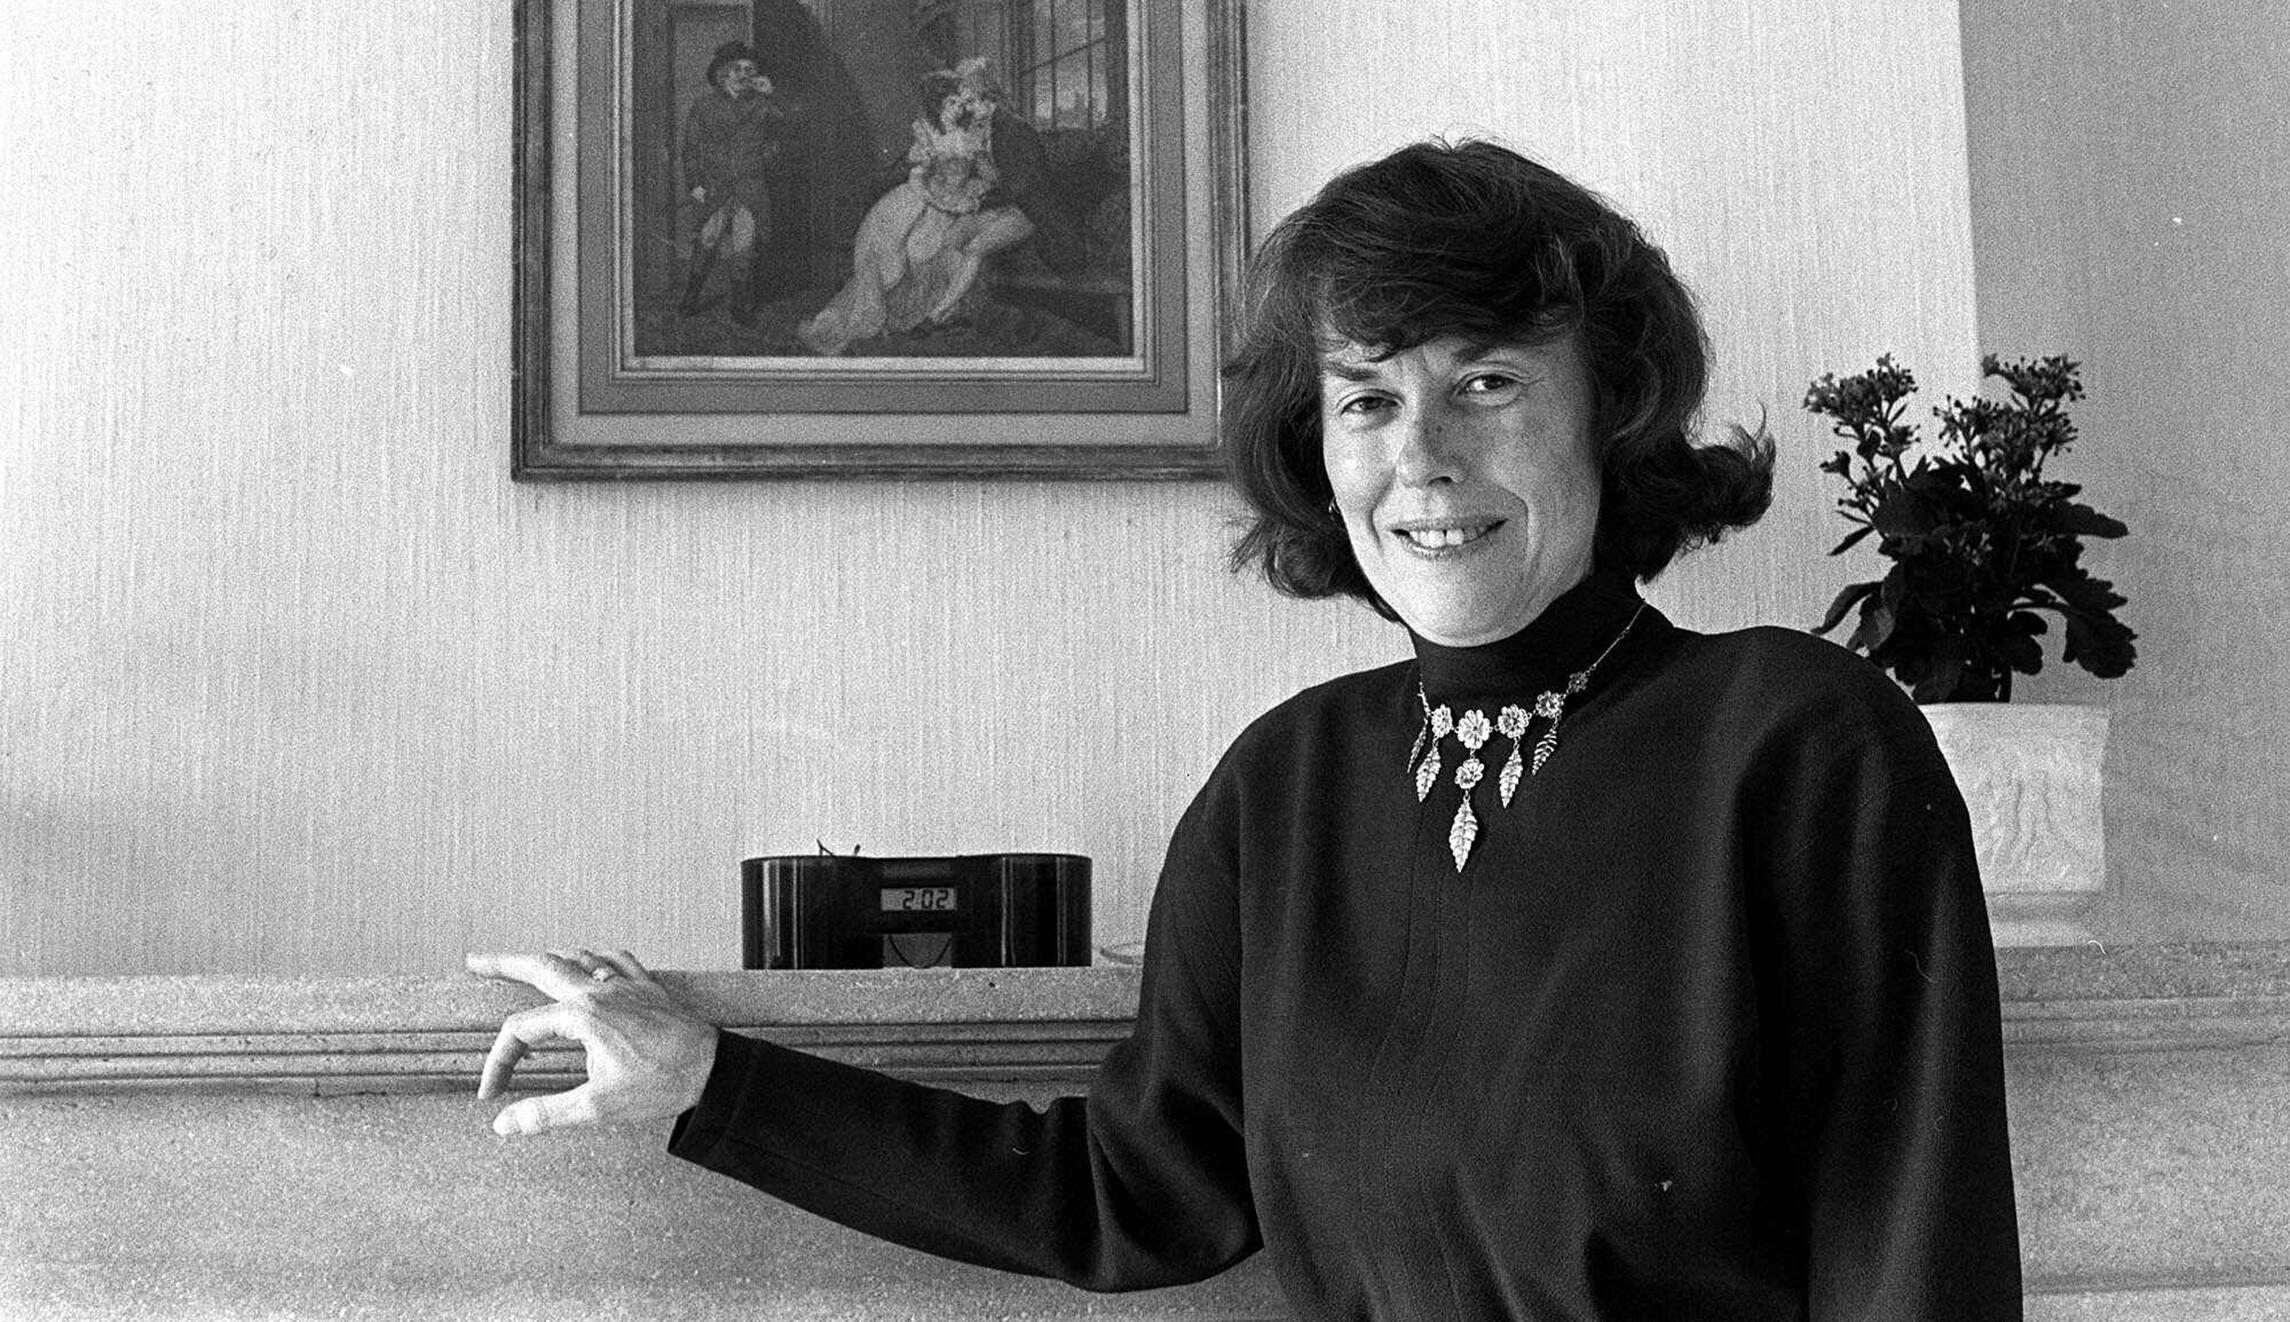 RIP Ambassador Faith Whittlesey, a loyal Trump supporter